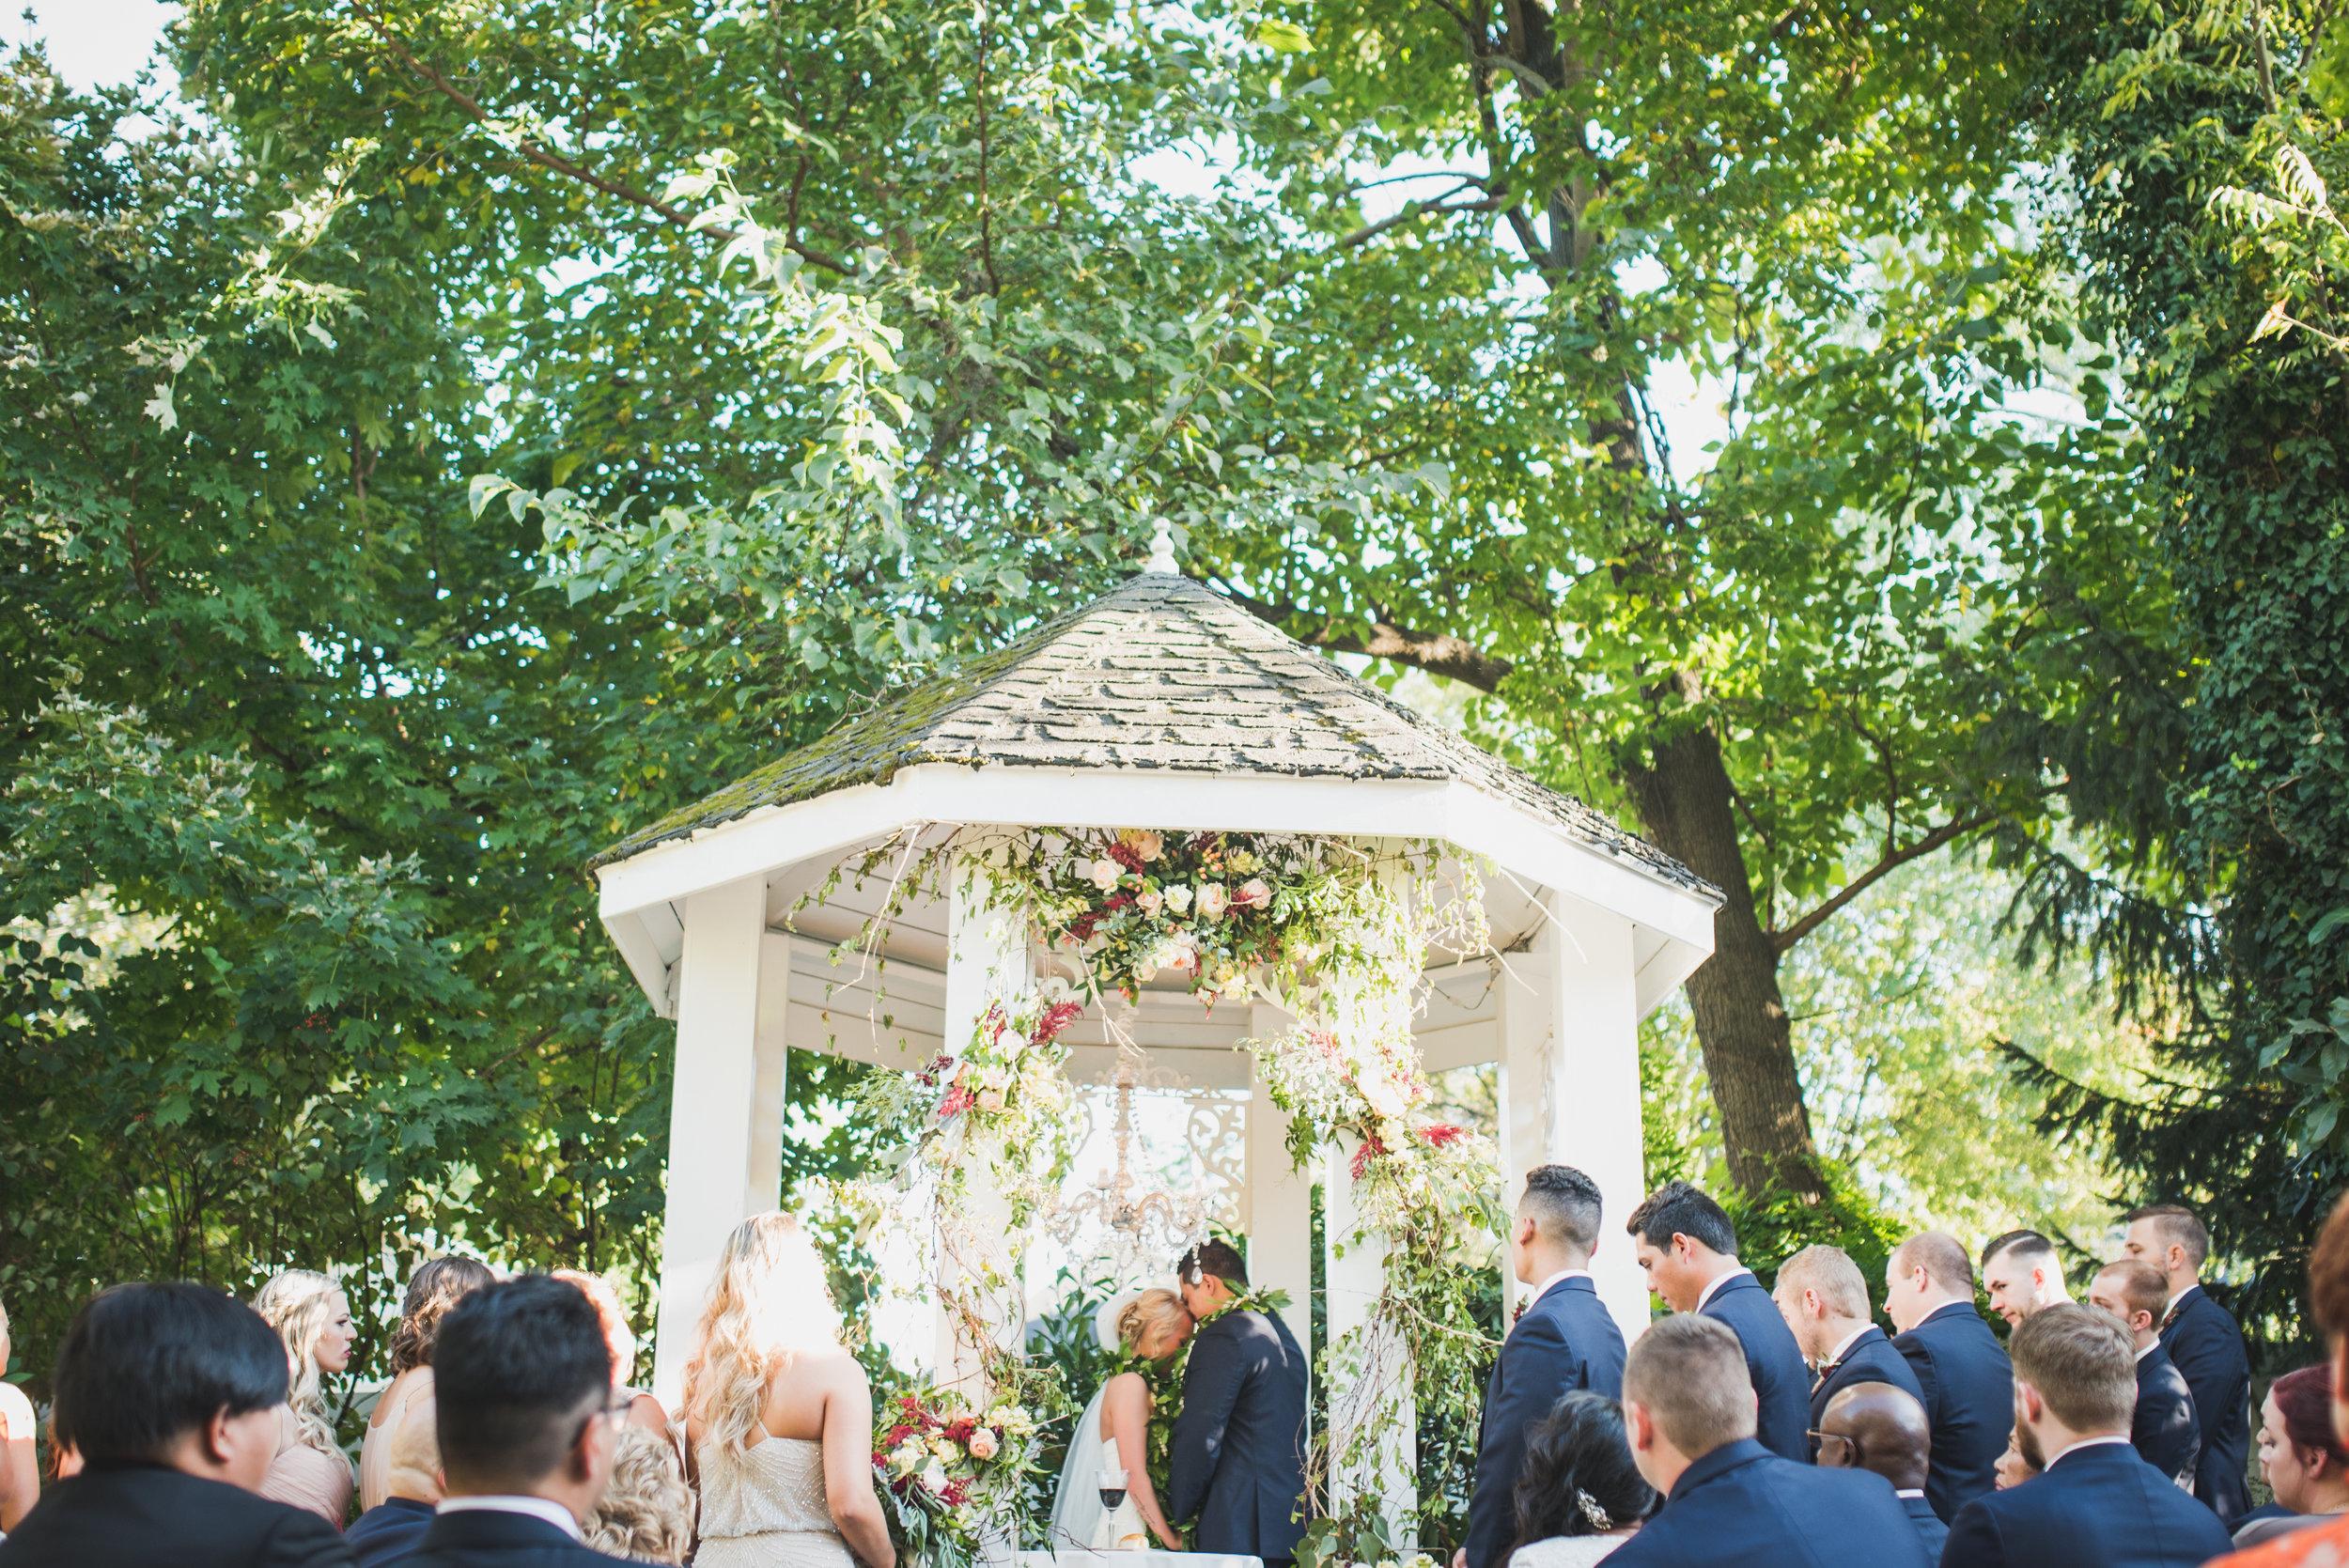 Nashville-wedding-photographers-CJ's-Off-The-Square-33.JPG